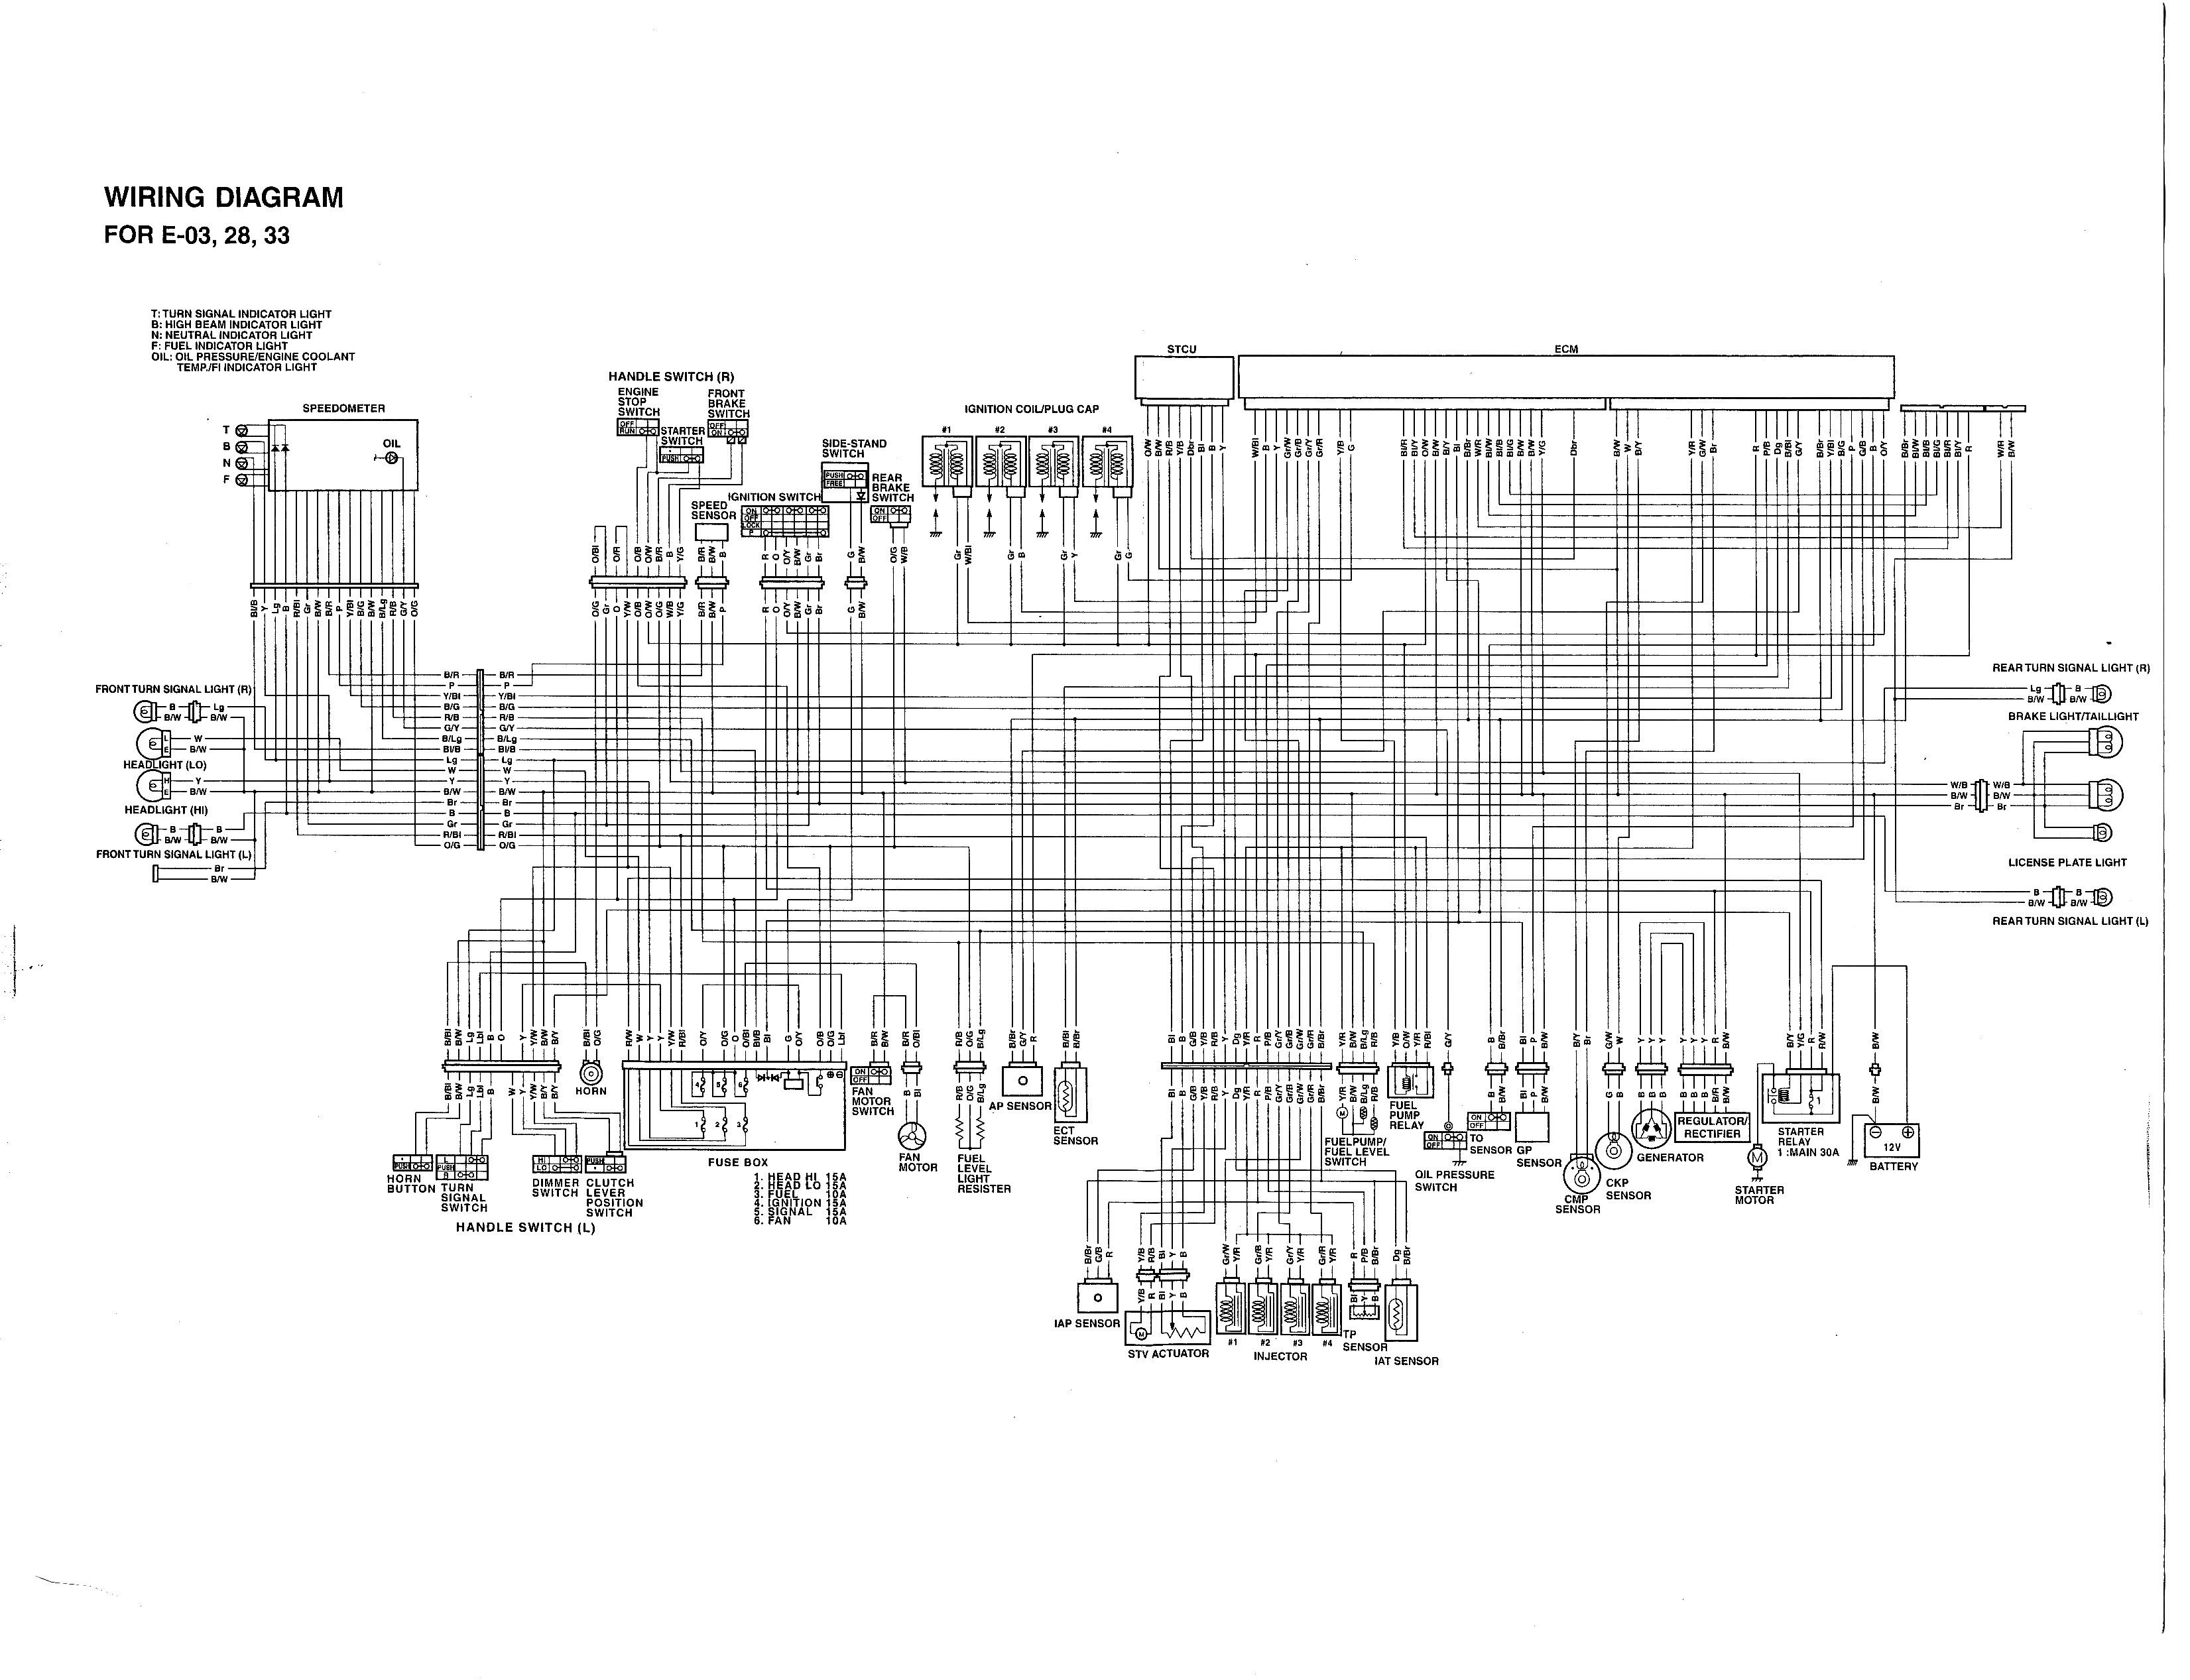 2002 Gsxr 750 Wiring Diagram - Trusted Wiring Diagrams  Drz Wiring Diagram on kdx 200 wiring diagram, rmz 450 wiring diagram, crf 250 wiring diagram, kdx 220 wiring diagram, sv 650 wiring diagram, tl 1000 wiring diagram, suzuki wiring diagram, beta wiring diagram, gs1000 wiring diagram, ltr 450 wiring diagram, kx 125 wiring diagram, raptor 700 wiring diagram, crf 50 wiring diagram, gsxr wiring diagram, kx 500 wiring diagram, dr650 wiring diagram, dr 125 wiring diagram, ktm wiring diagram, honda wiring diagram, yamaha wiring diagram,